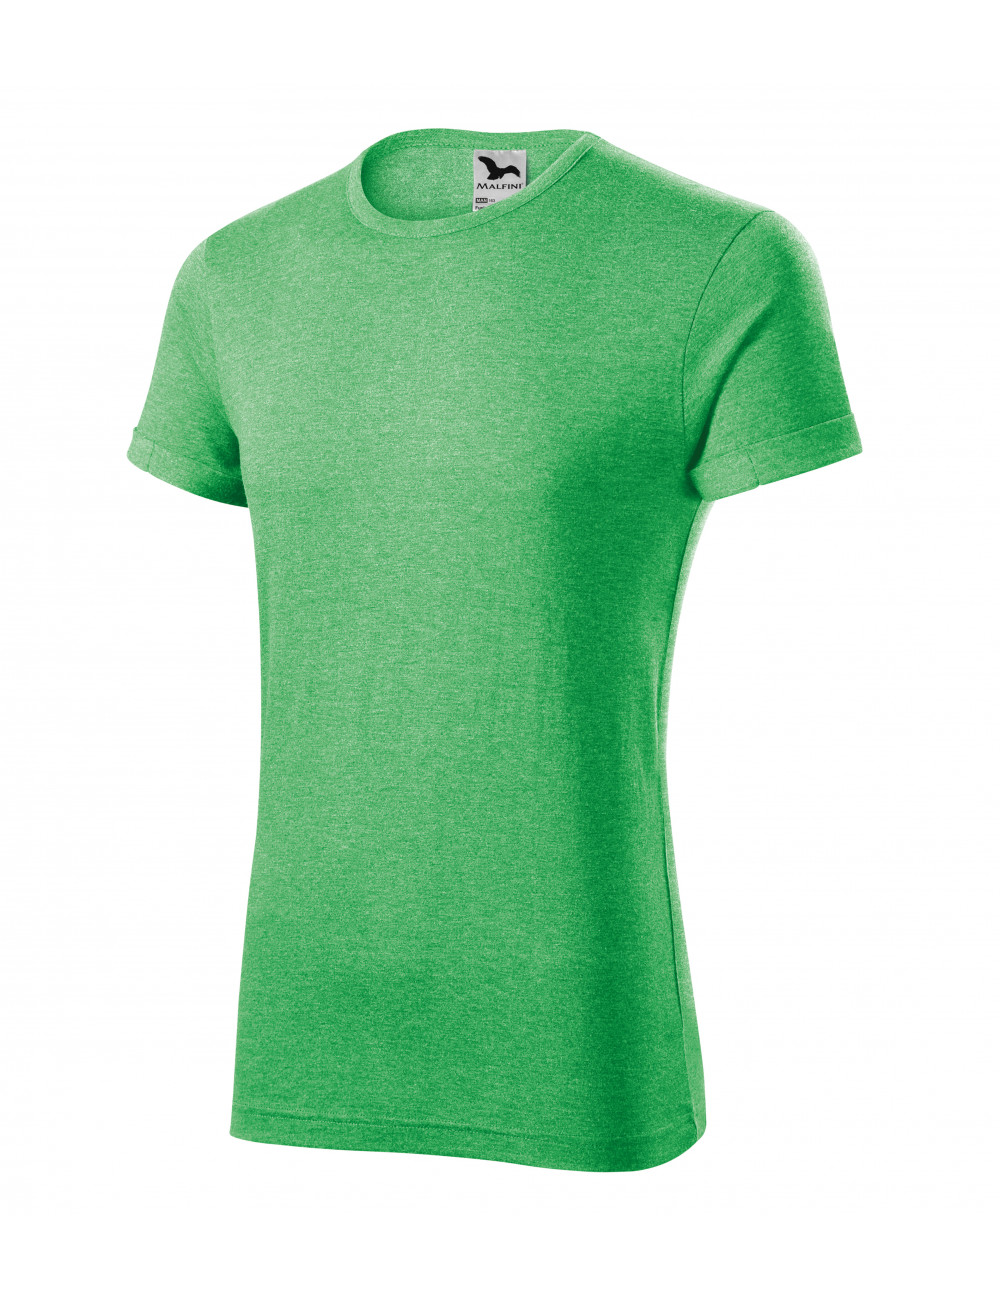 Adler MALFINI Koszulka męska Fusion 163 zielony melanż